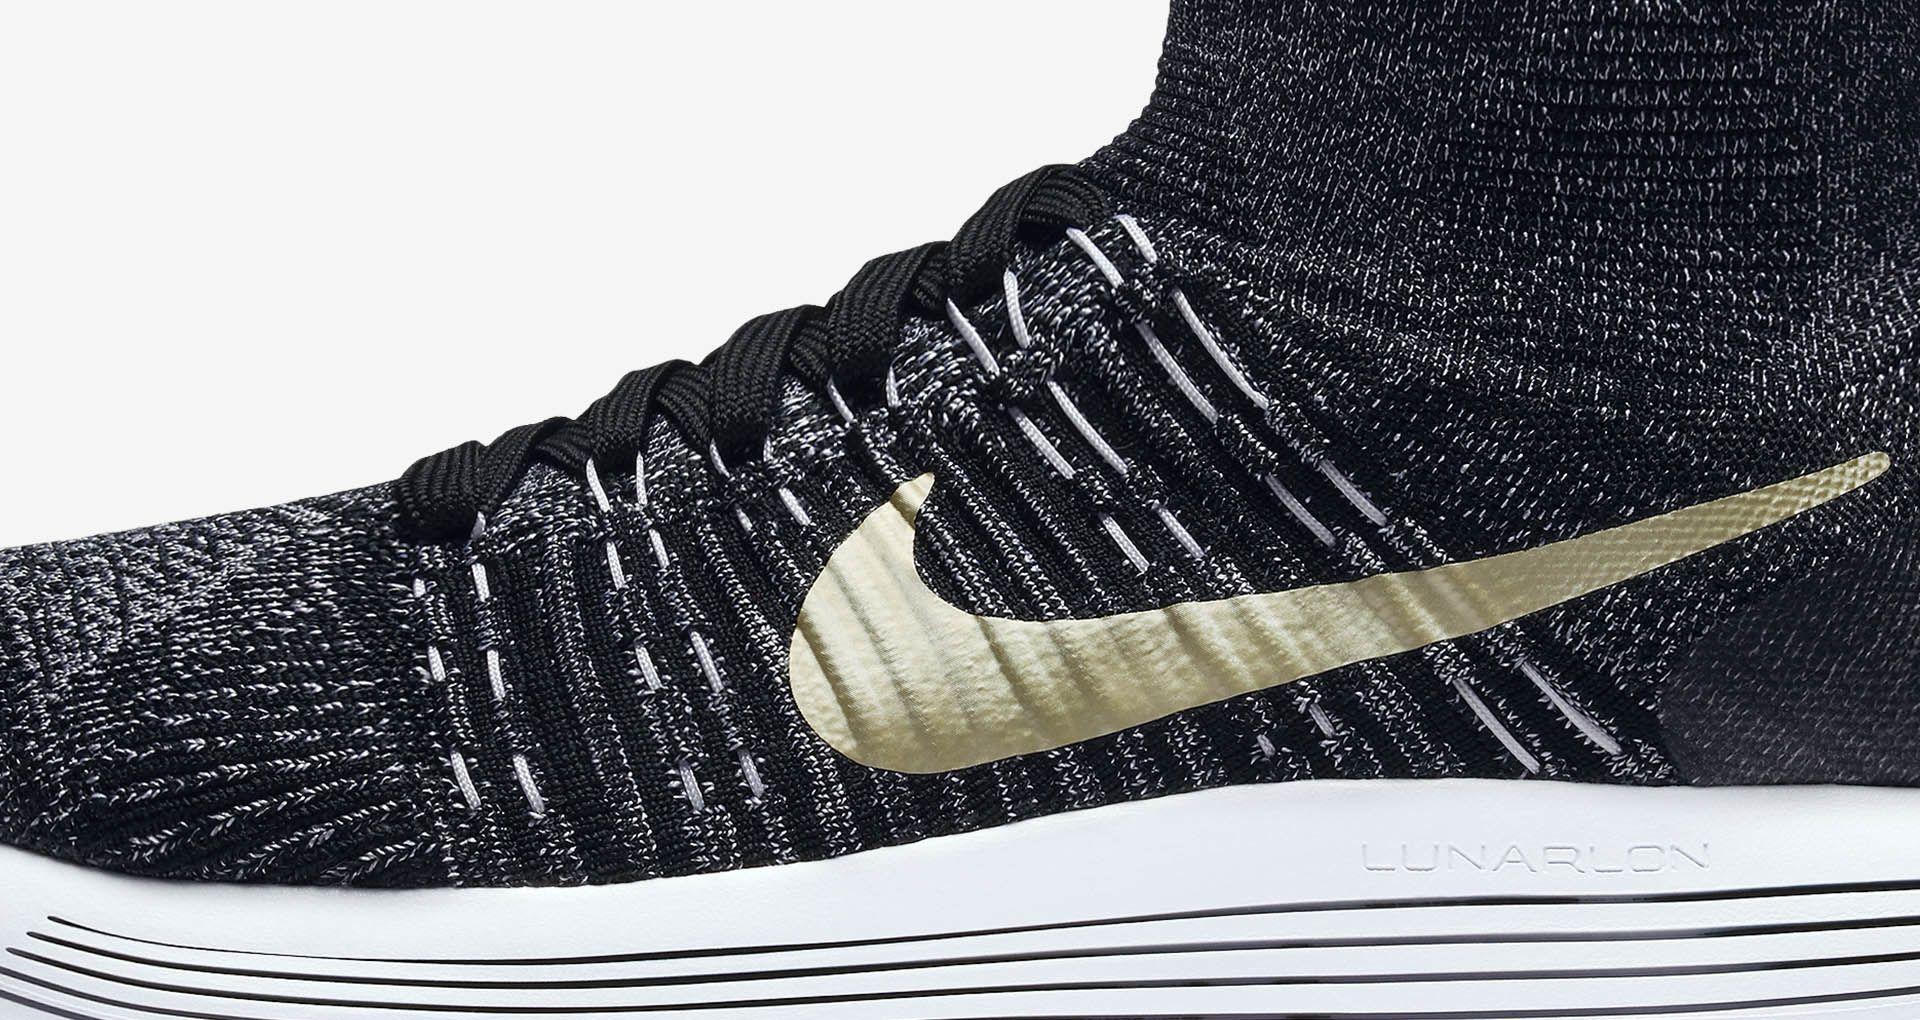 new style 03cc7 03184 Nike Lunarepic Flyknit BHM 2017